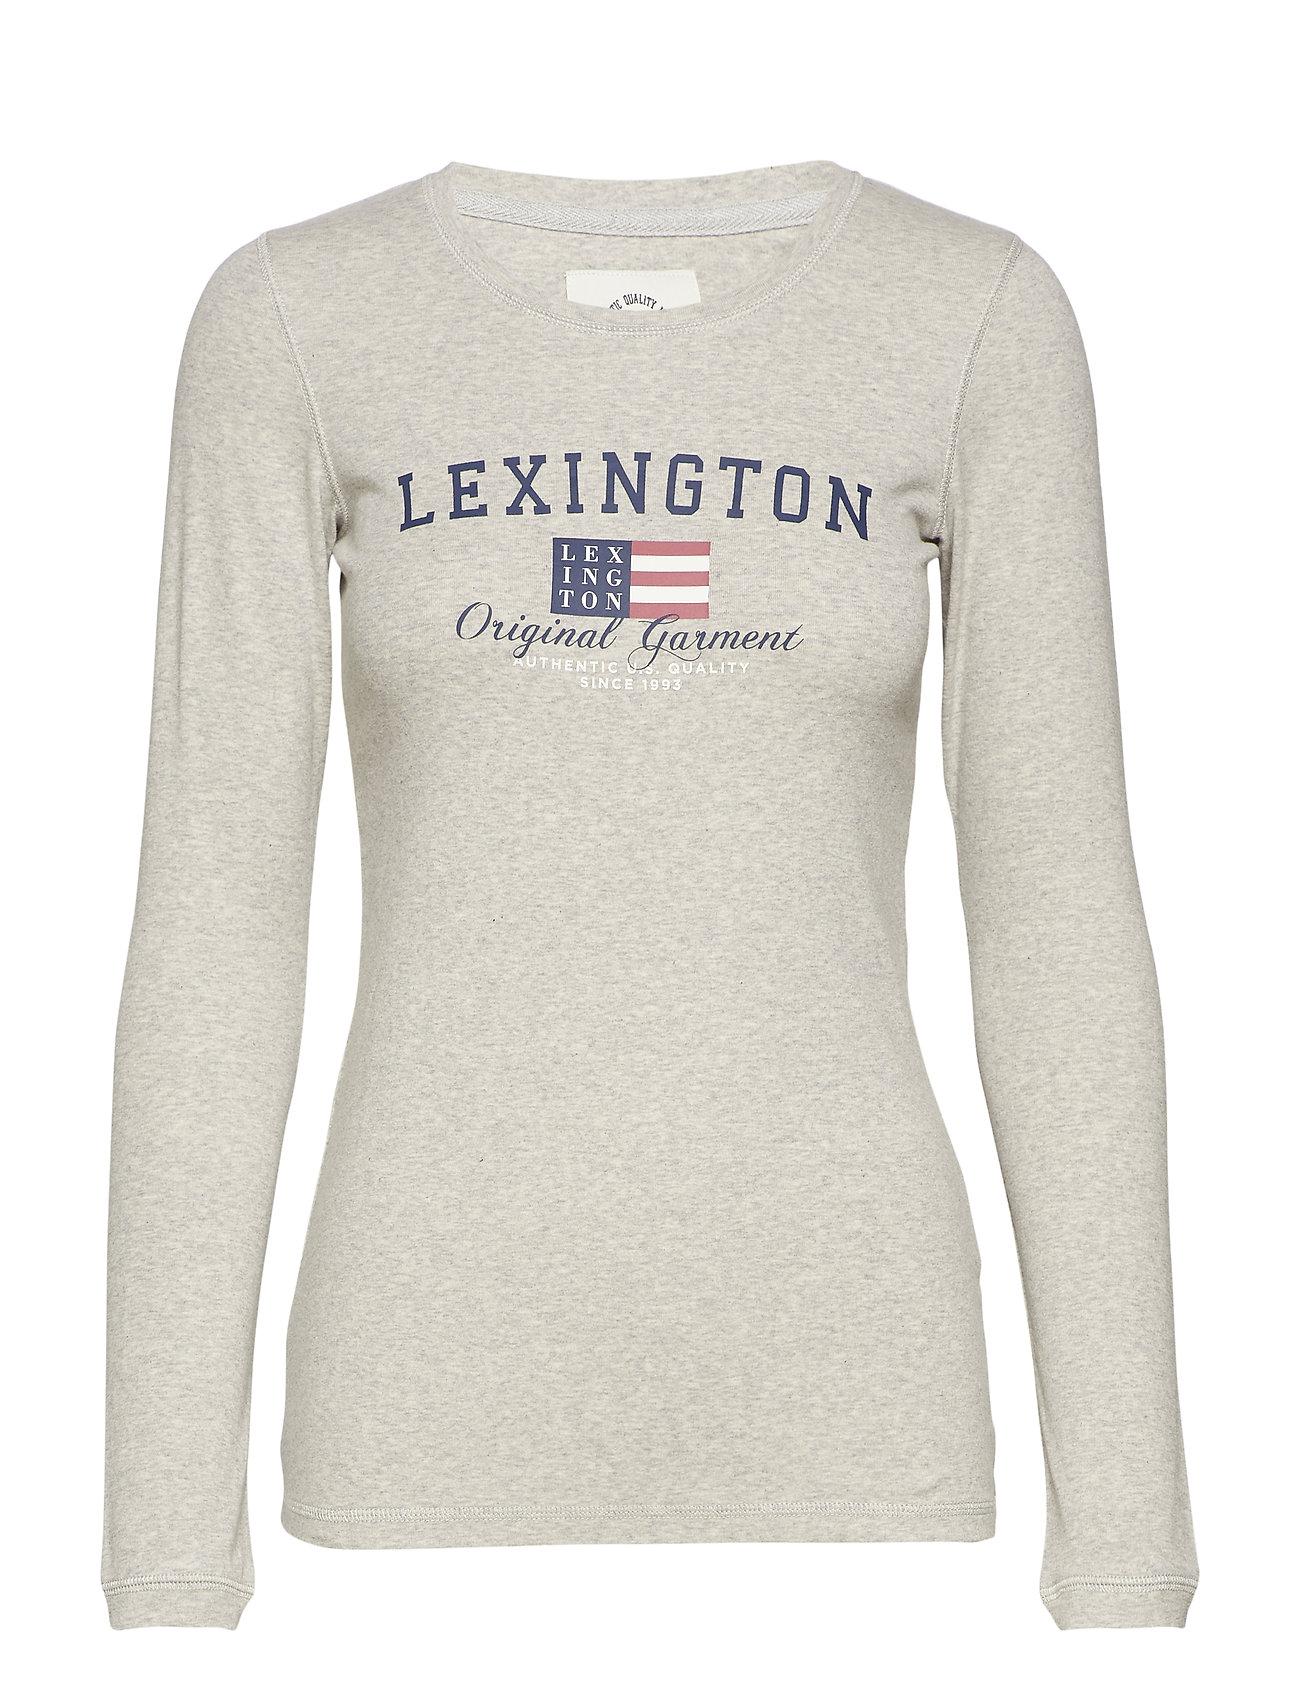 Teelt MelangeLexington Warm Clothing Thelma Gray 0knwO8P